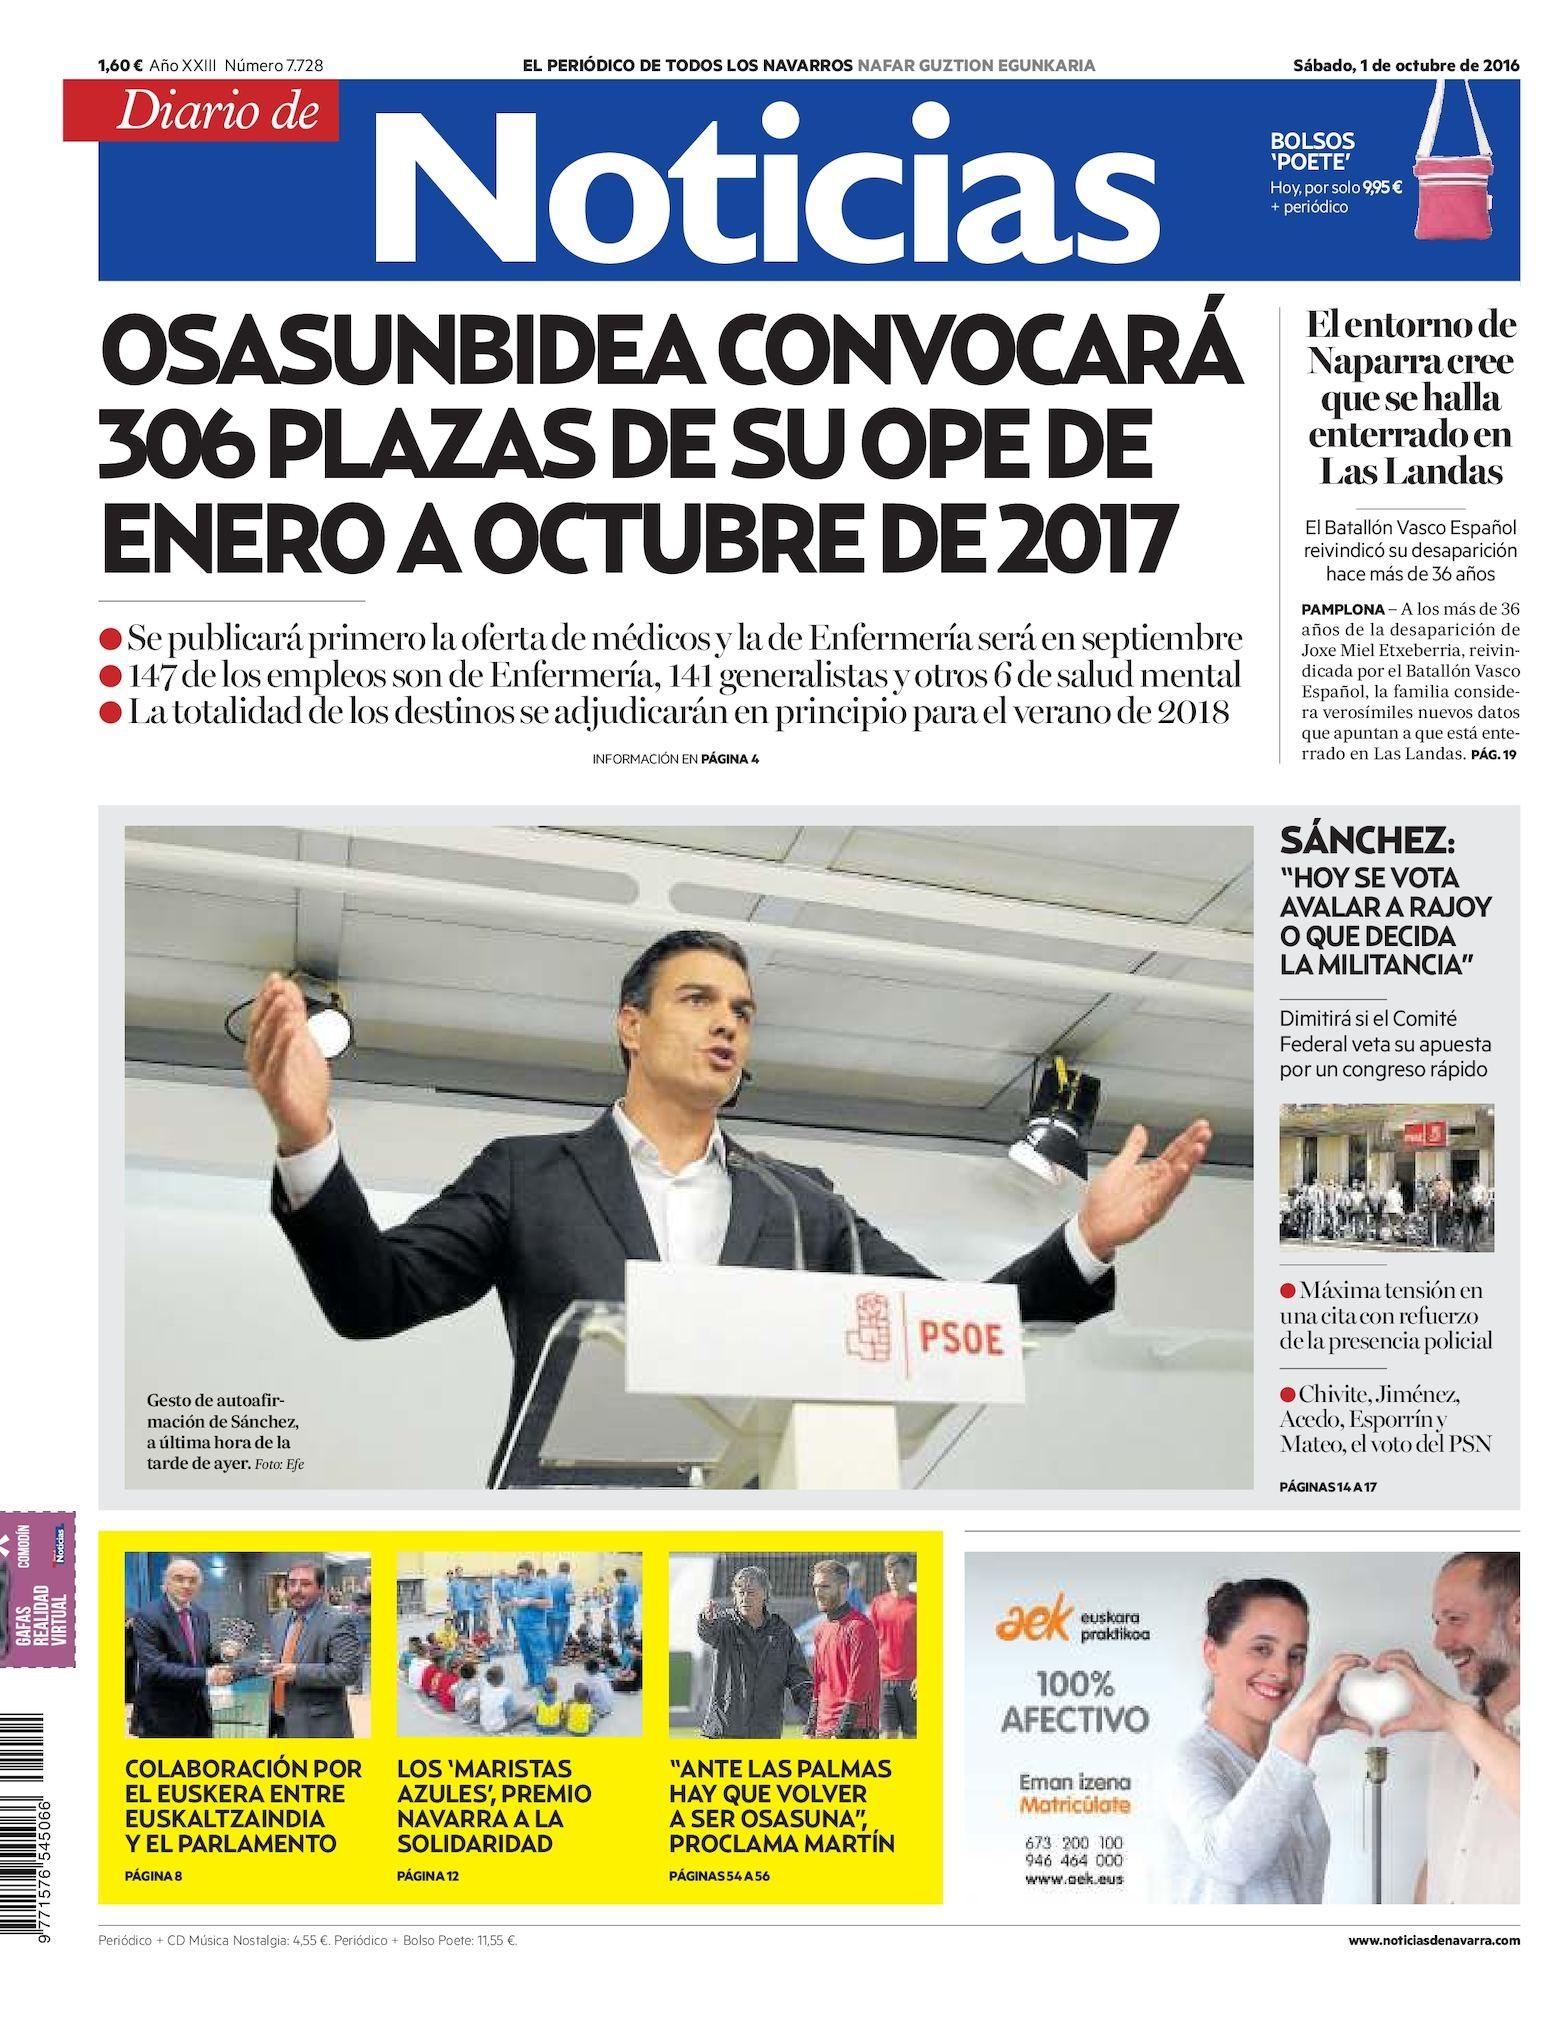 Calendario De Alava 2019 Más Populares Calaméo Diario De Noticias Of Calendario De Alava 2019 Más Actual Pin De Inma Garca Surez En Baos T Baos Cuarto De